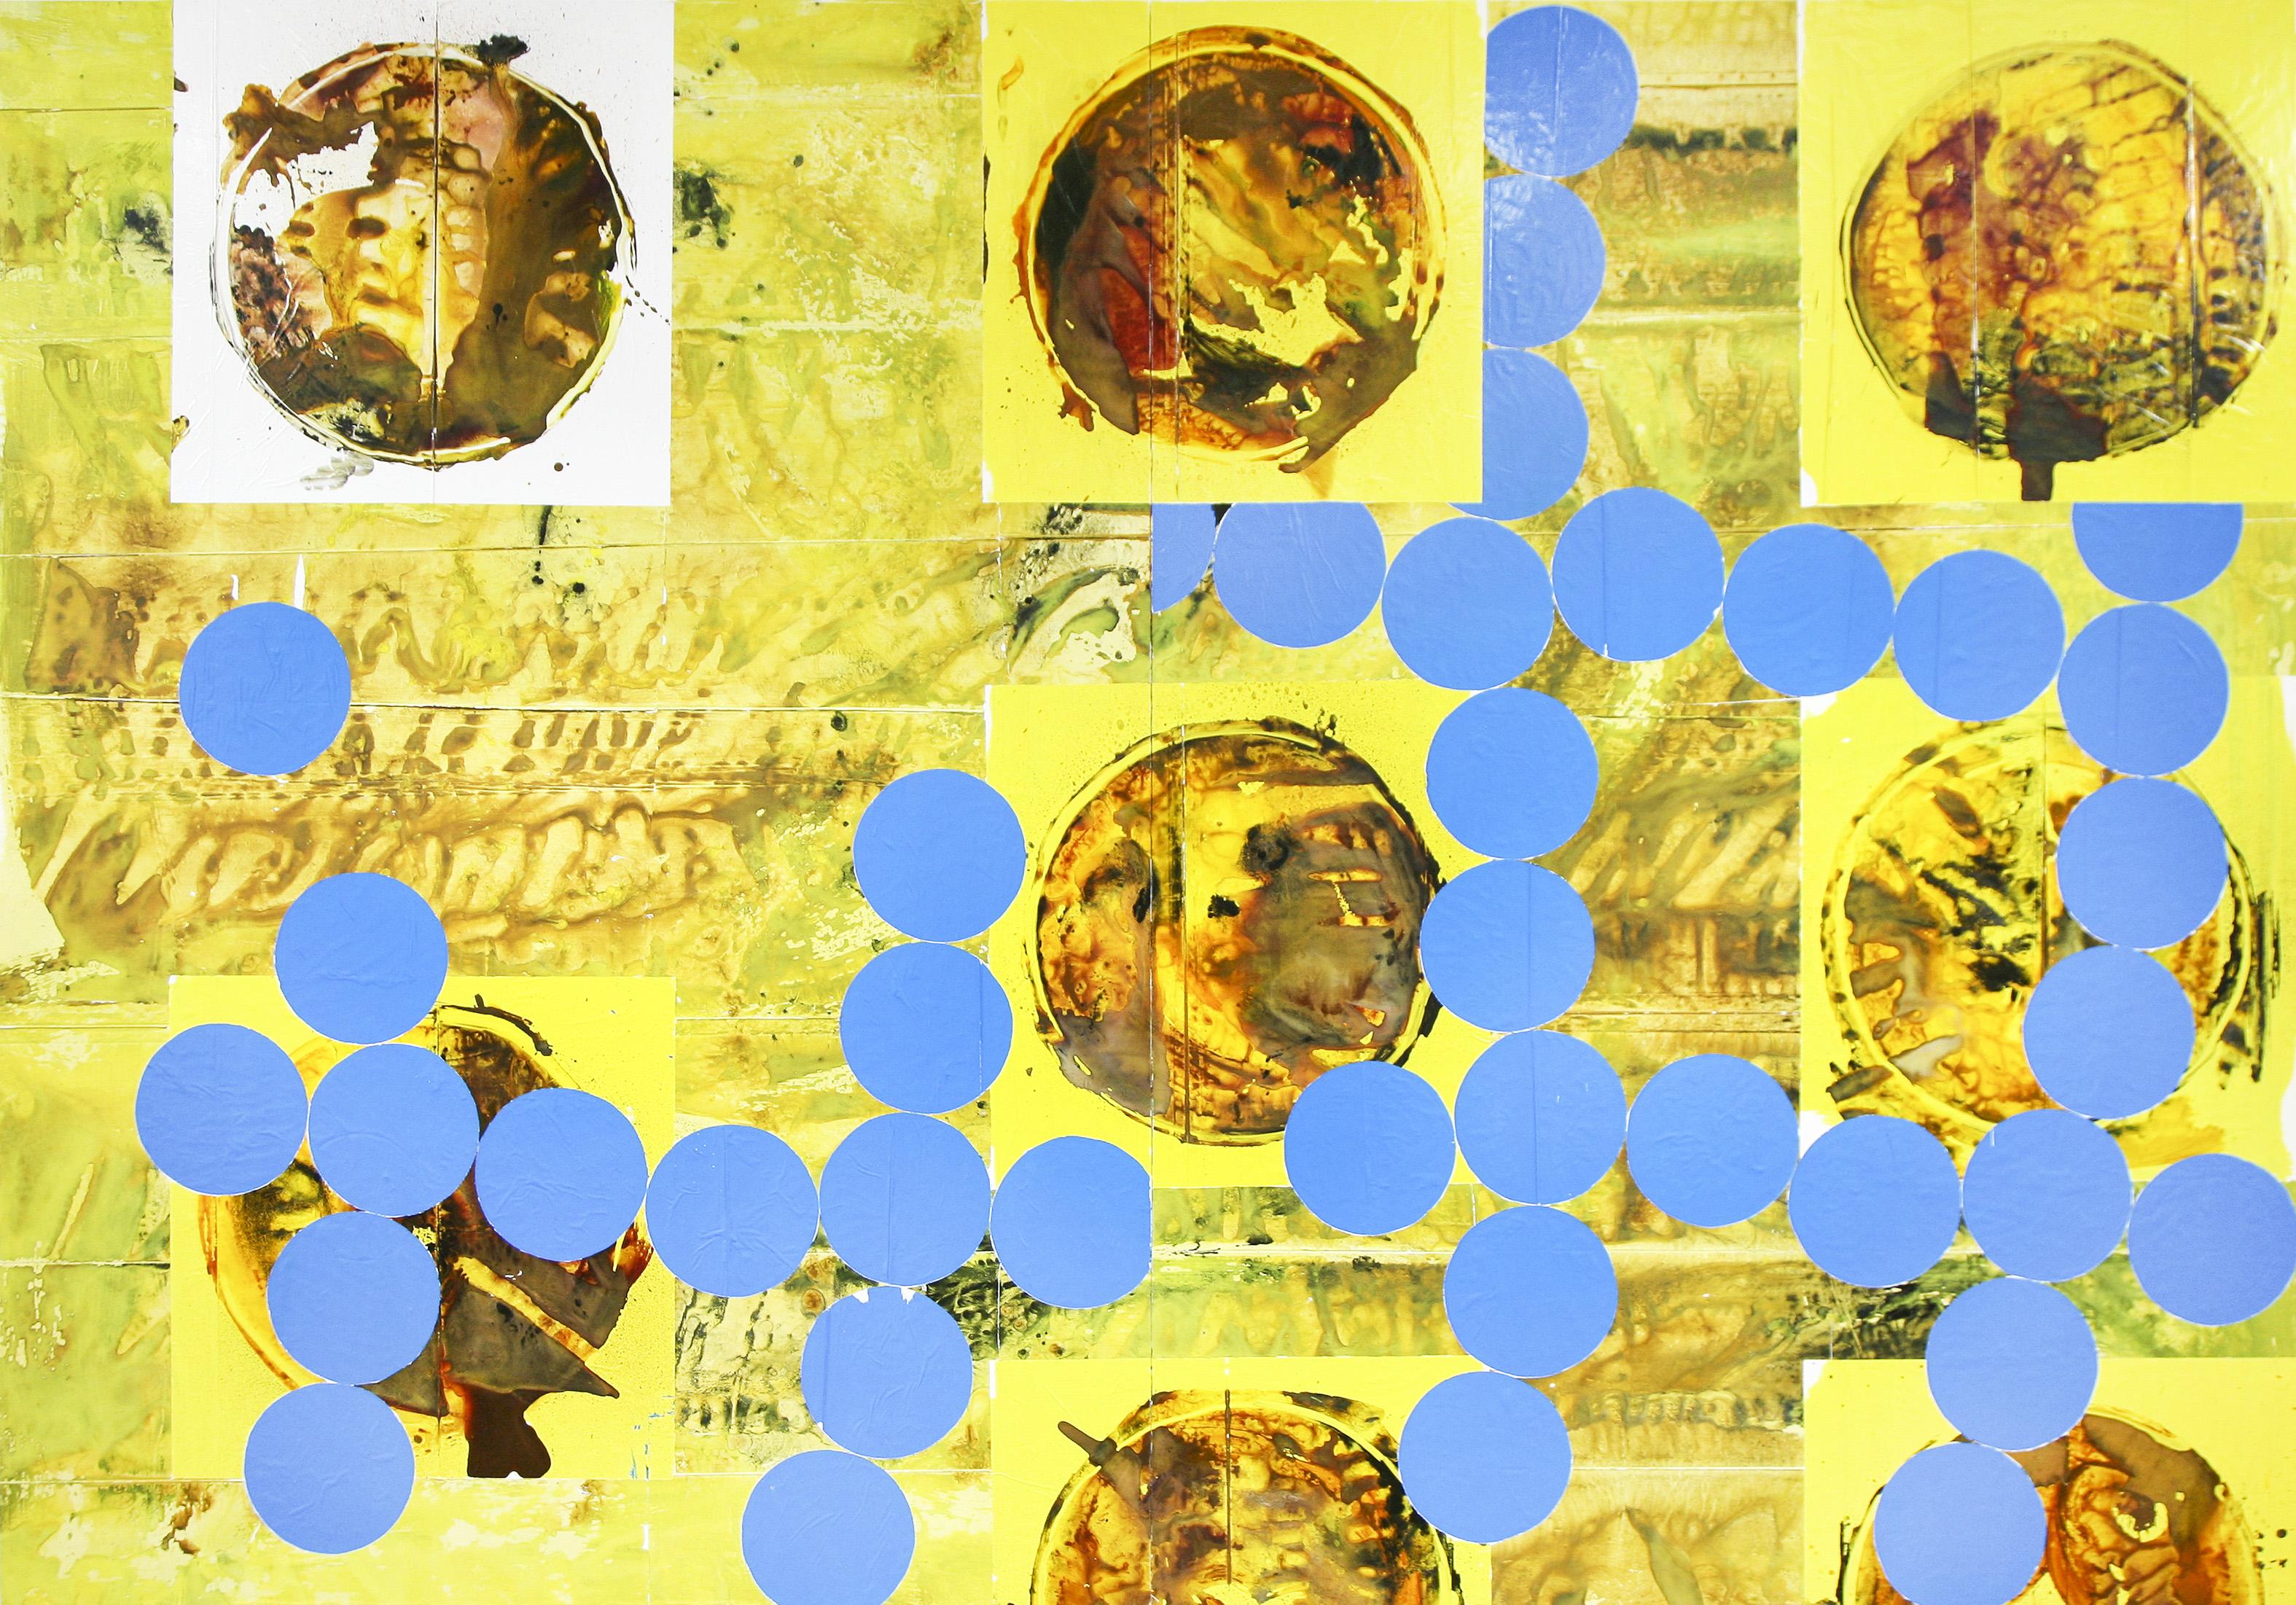 TolbertShane-UntitledDiptych-2017-AcrylicOnCanvas-84x120-HR